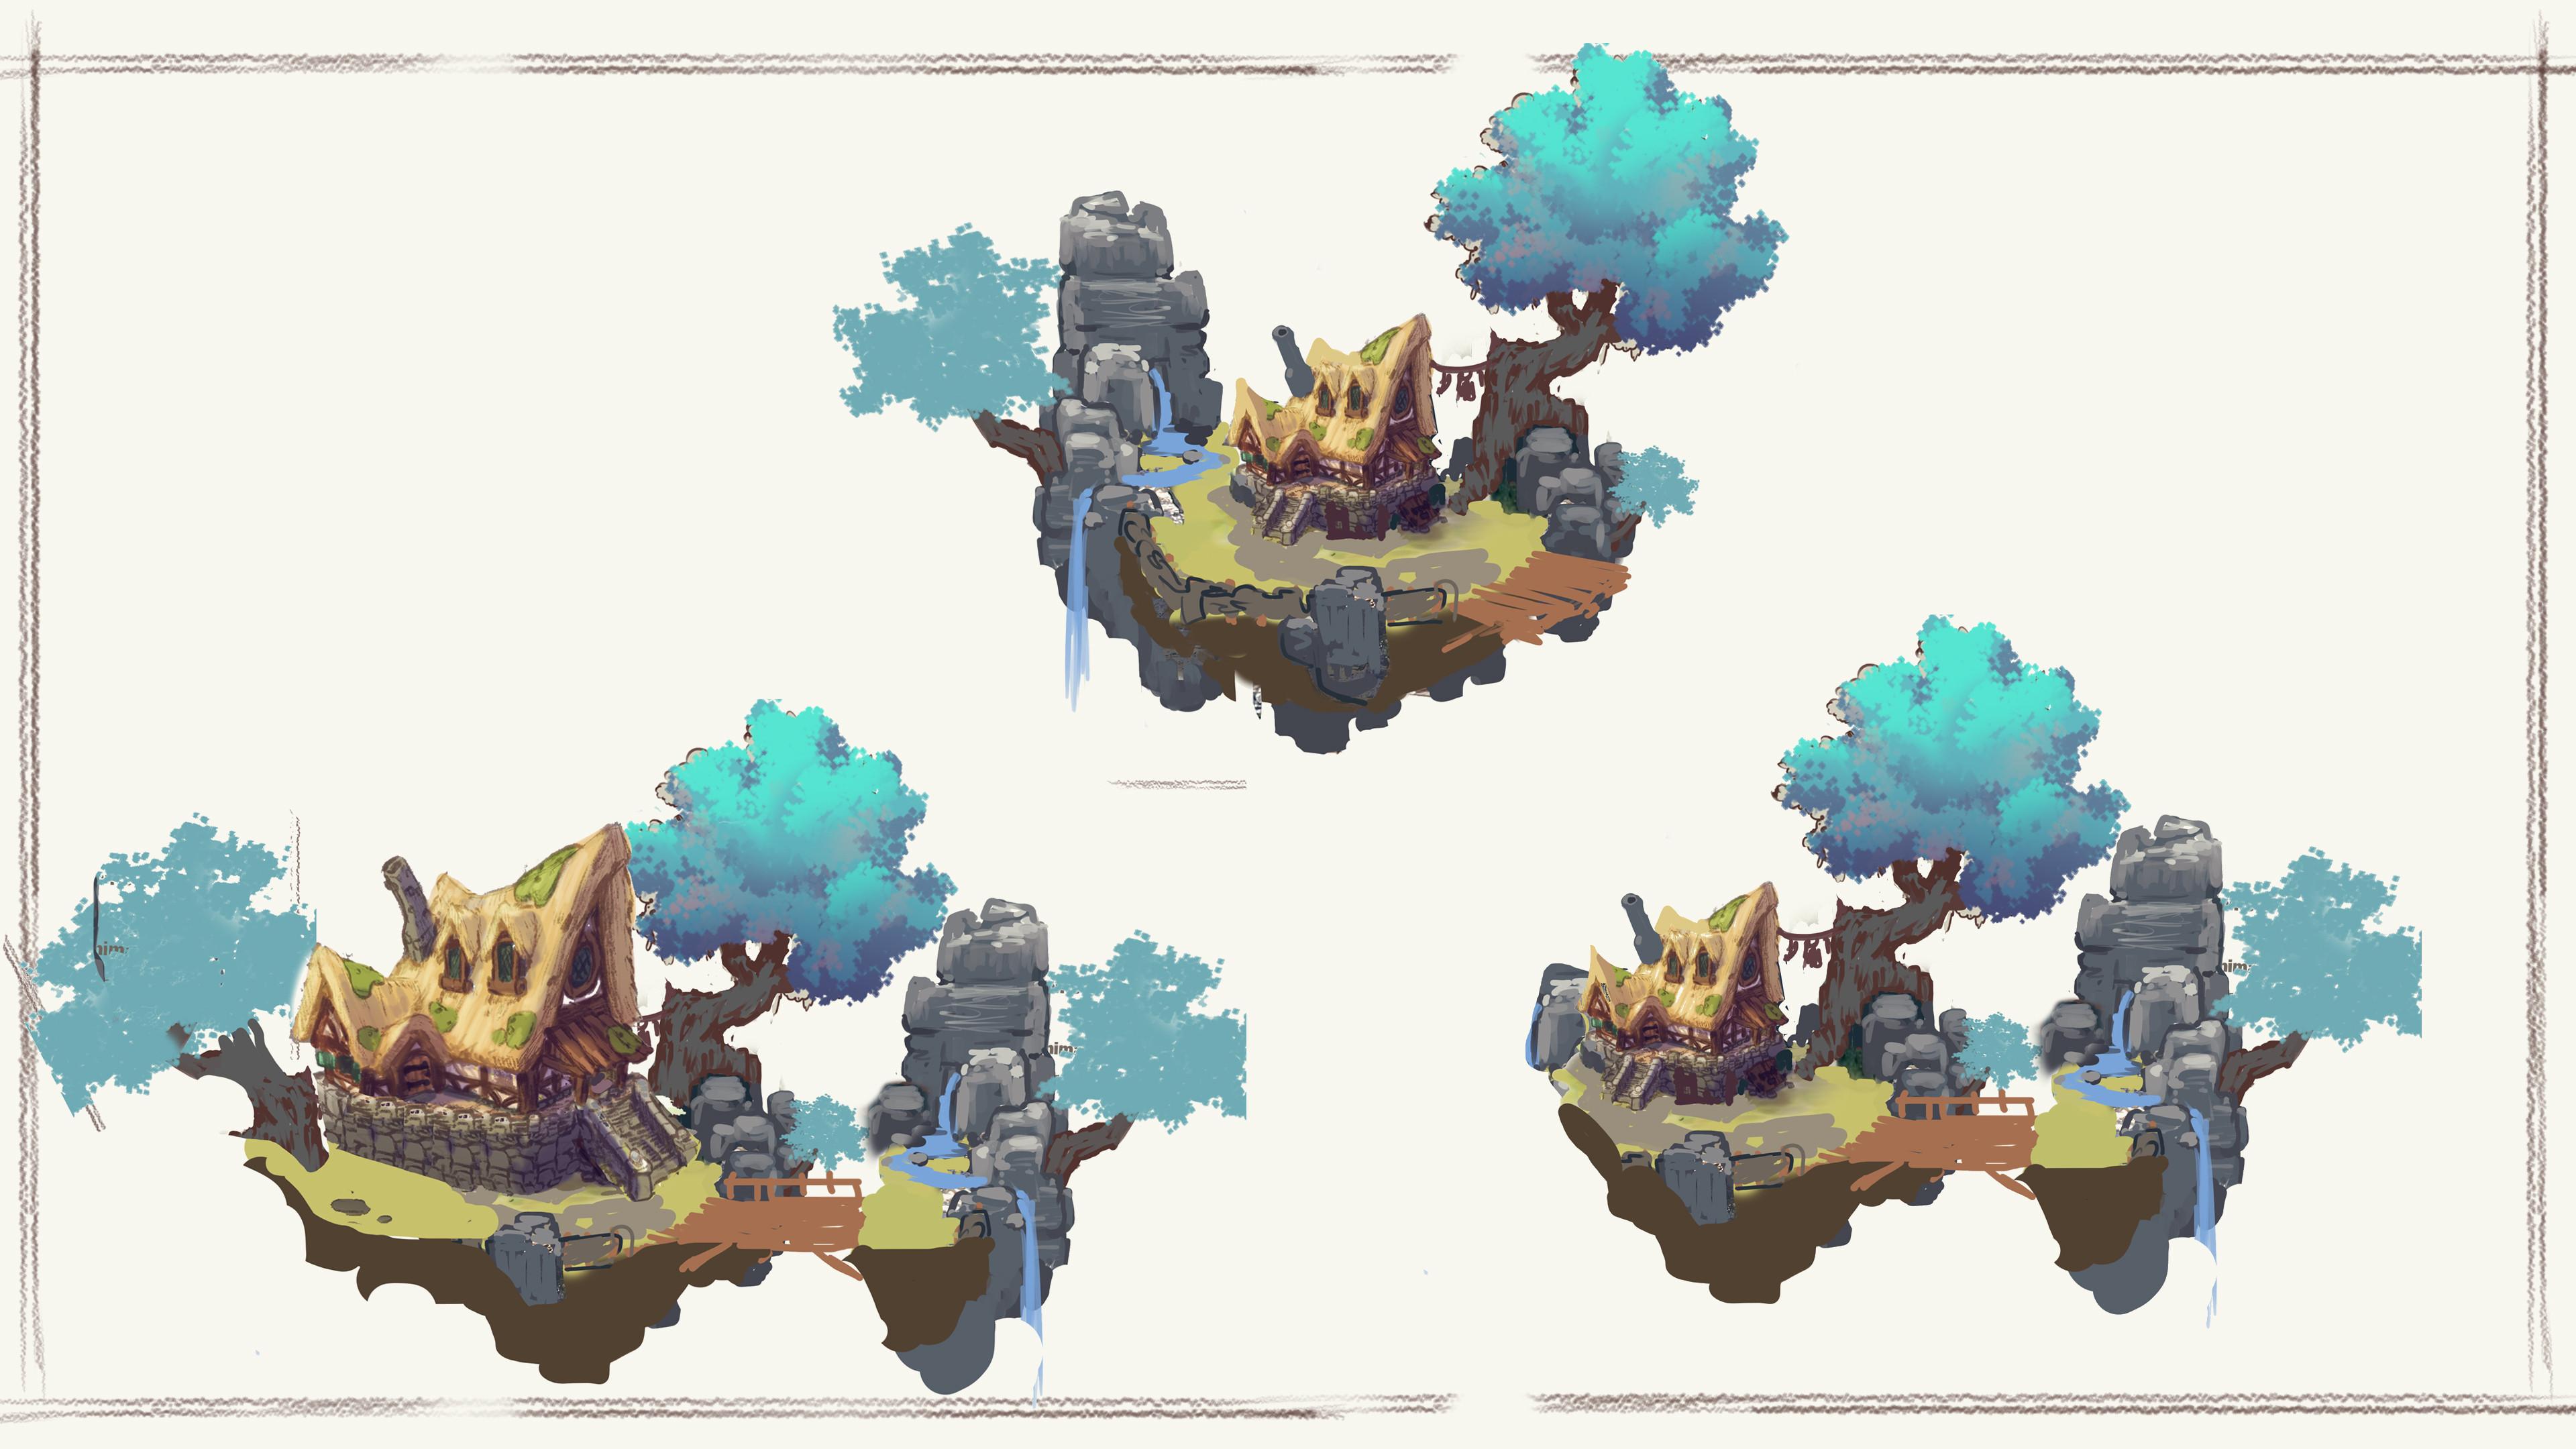 Exploration with different Islands setups